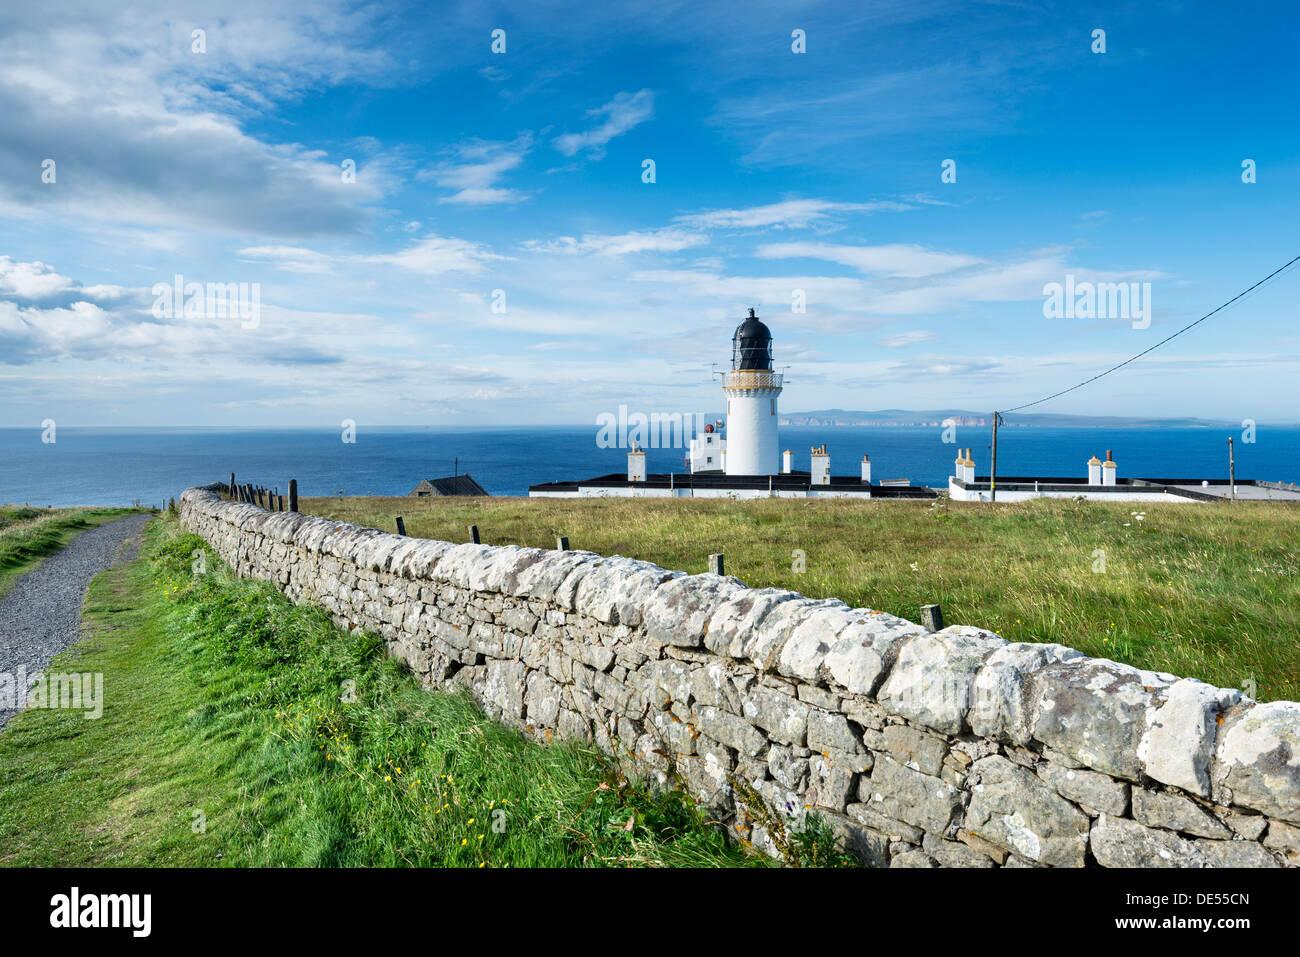 Dunnet Head lighthouse on the north coast of Scotland, Caithness, Scotland, United Kingdom, Europe - Stock Image